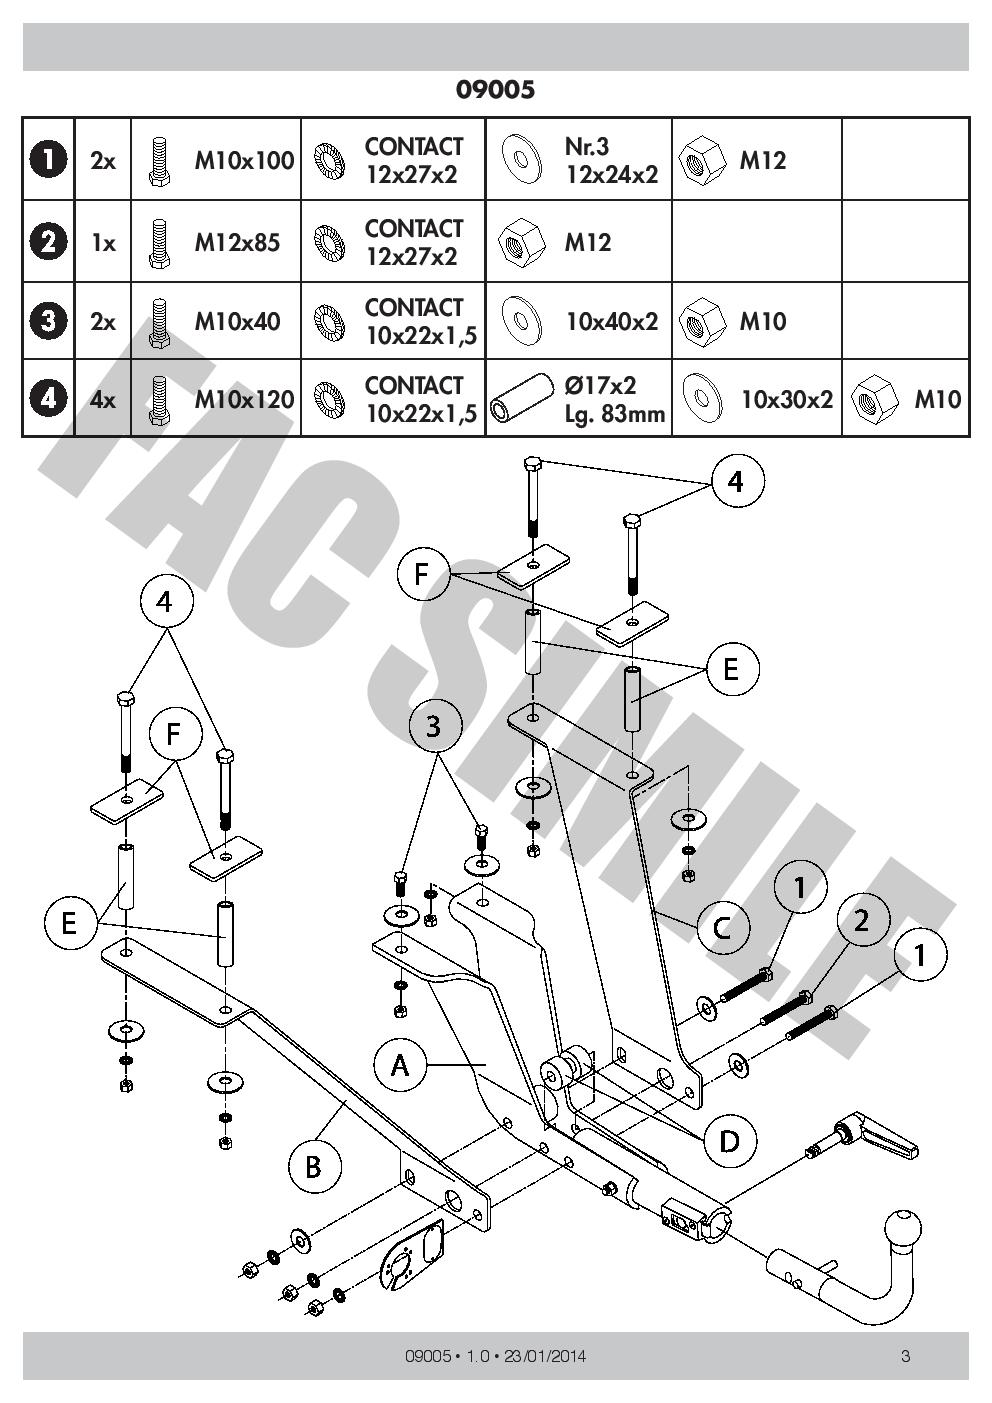 daihatsu terios wiring diagram free best wiring library Daihatsu Terios 2012 daihatsu terios wiring diagram wiring library rh 13 boptions1 de daihatsu terios wiring diagram free daihatsu